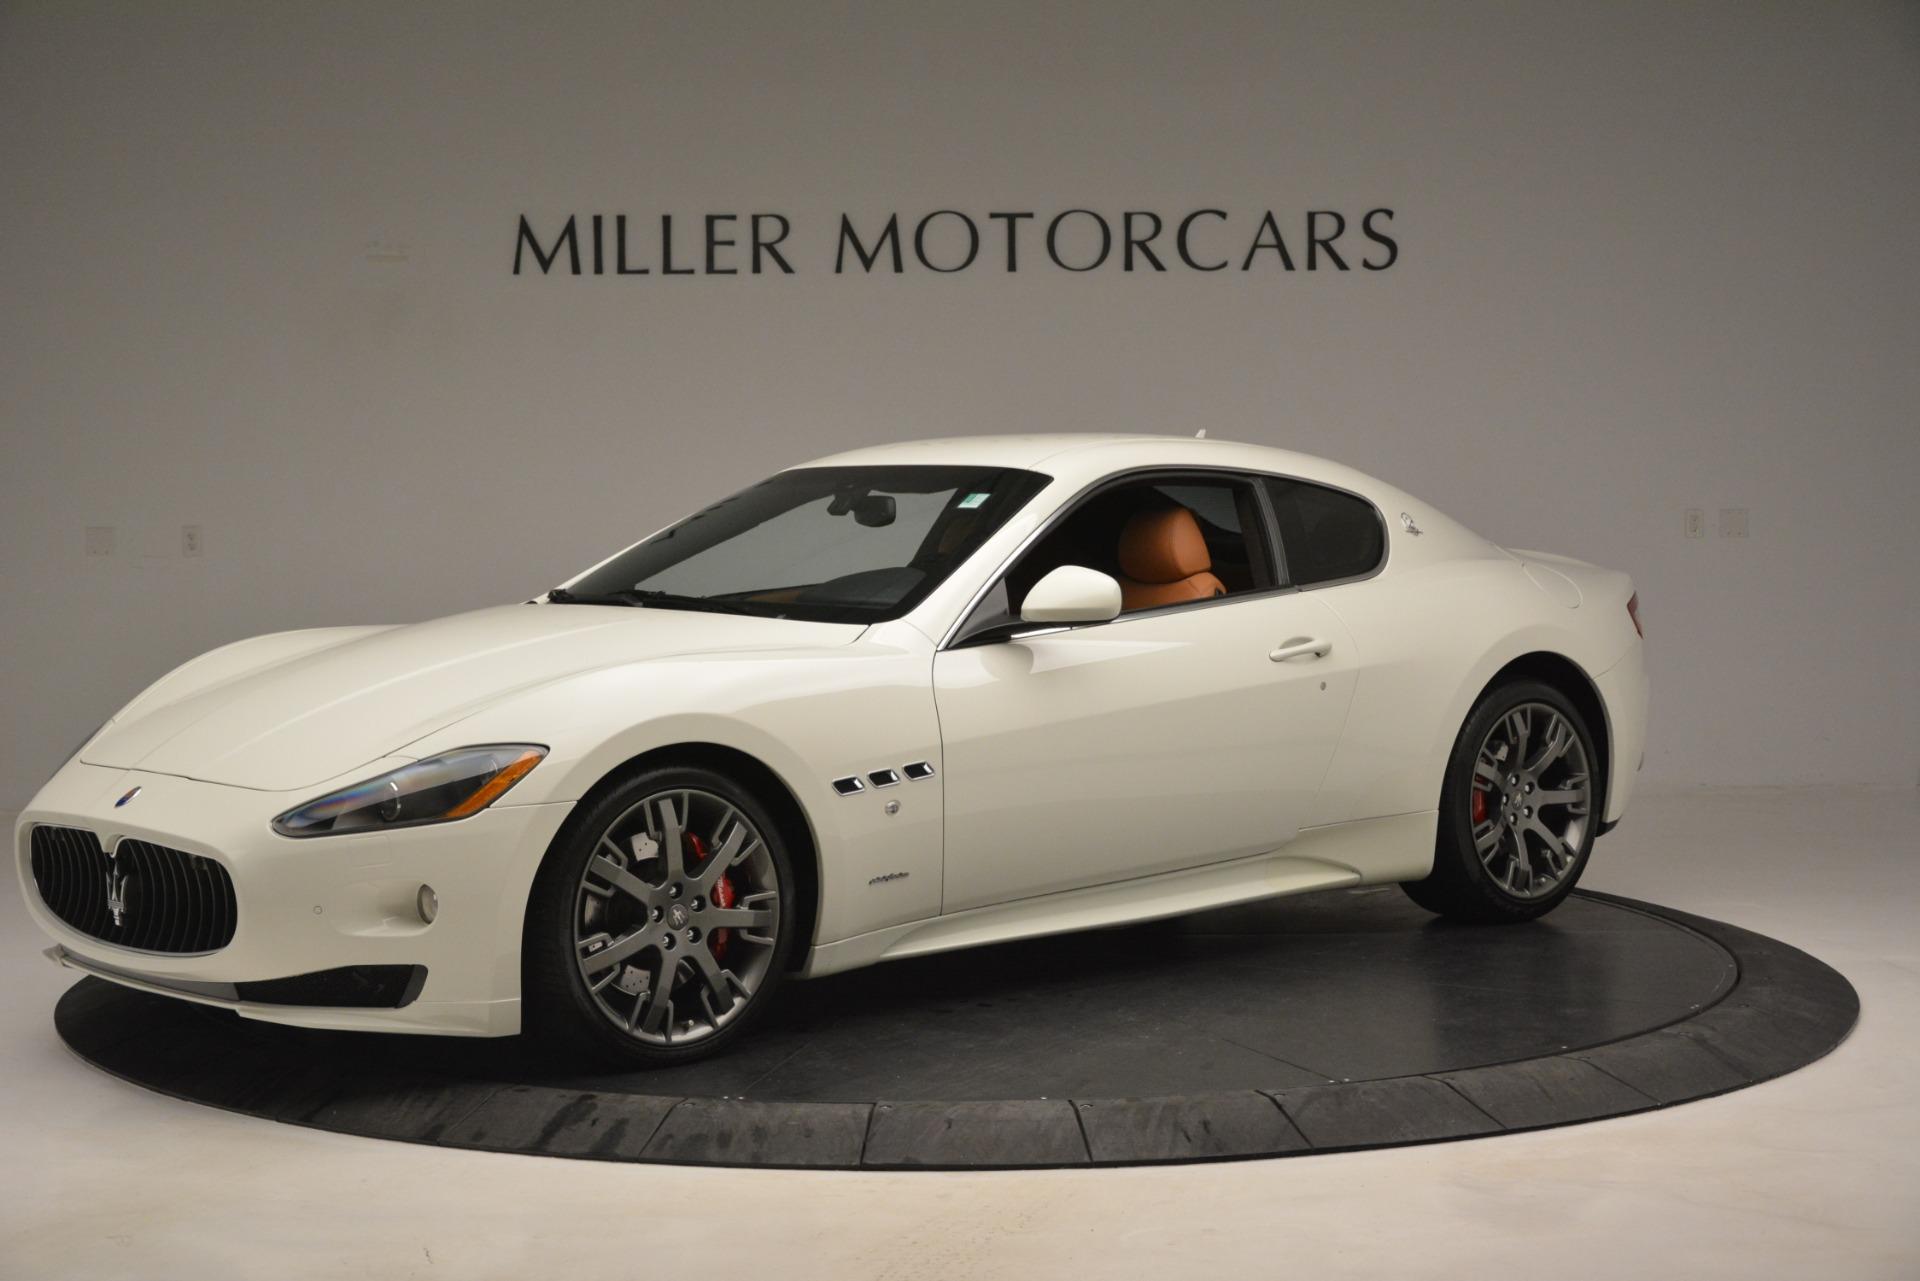 Used 2011 Maserati GranTurismo S Automatic For Sale In Westport, CT 3061_p2